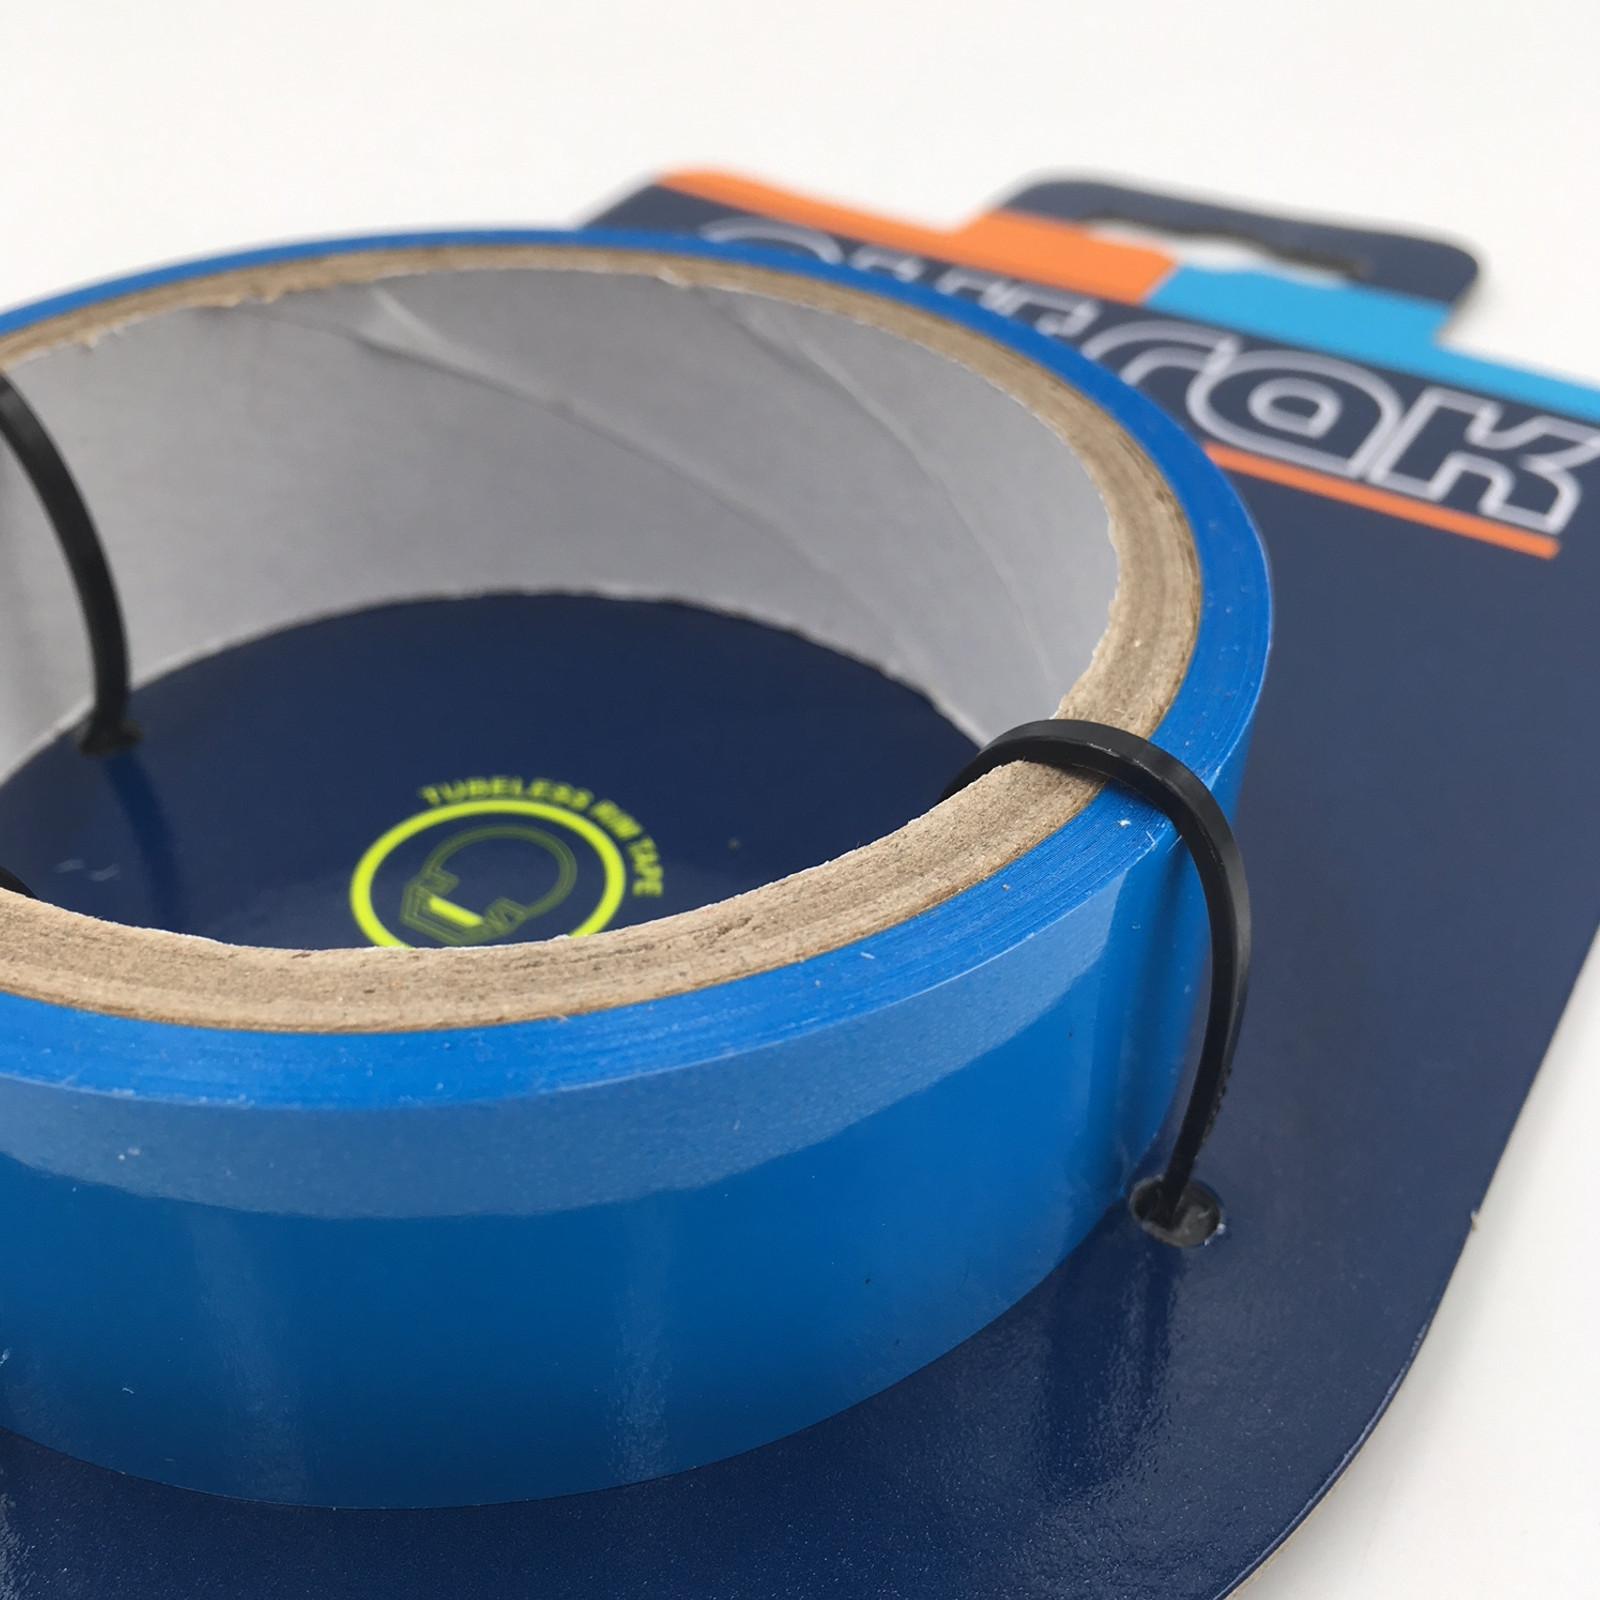 Nutrak-Tubeless-Ready-Waterproof-Rim-Tape-Blue-10m-Roll thumbnail 14